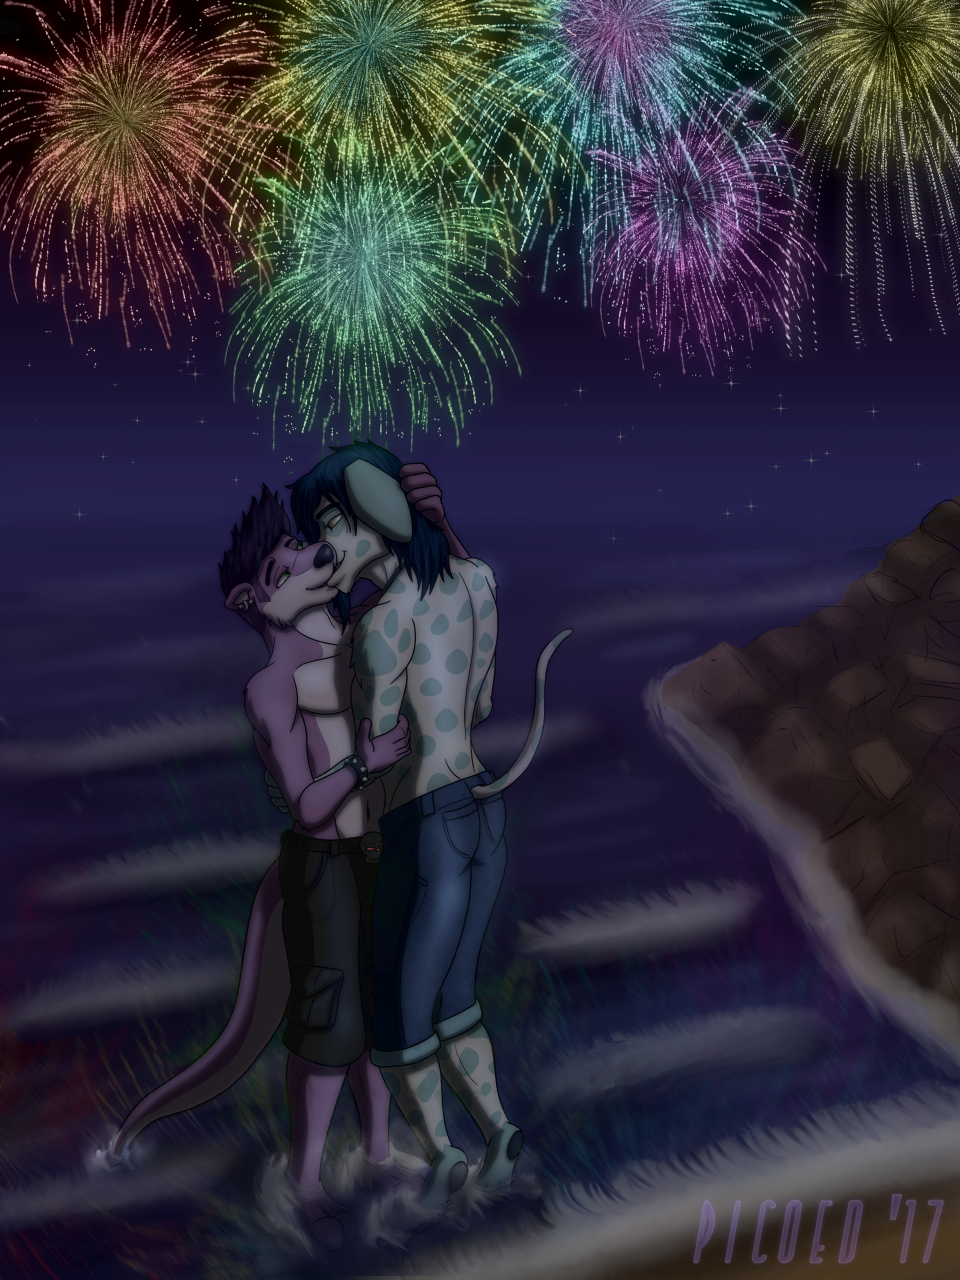 Fireworks - Redux